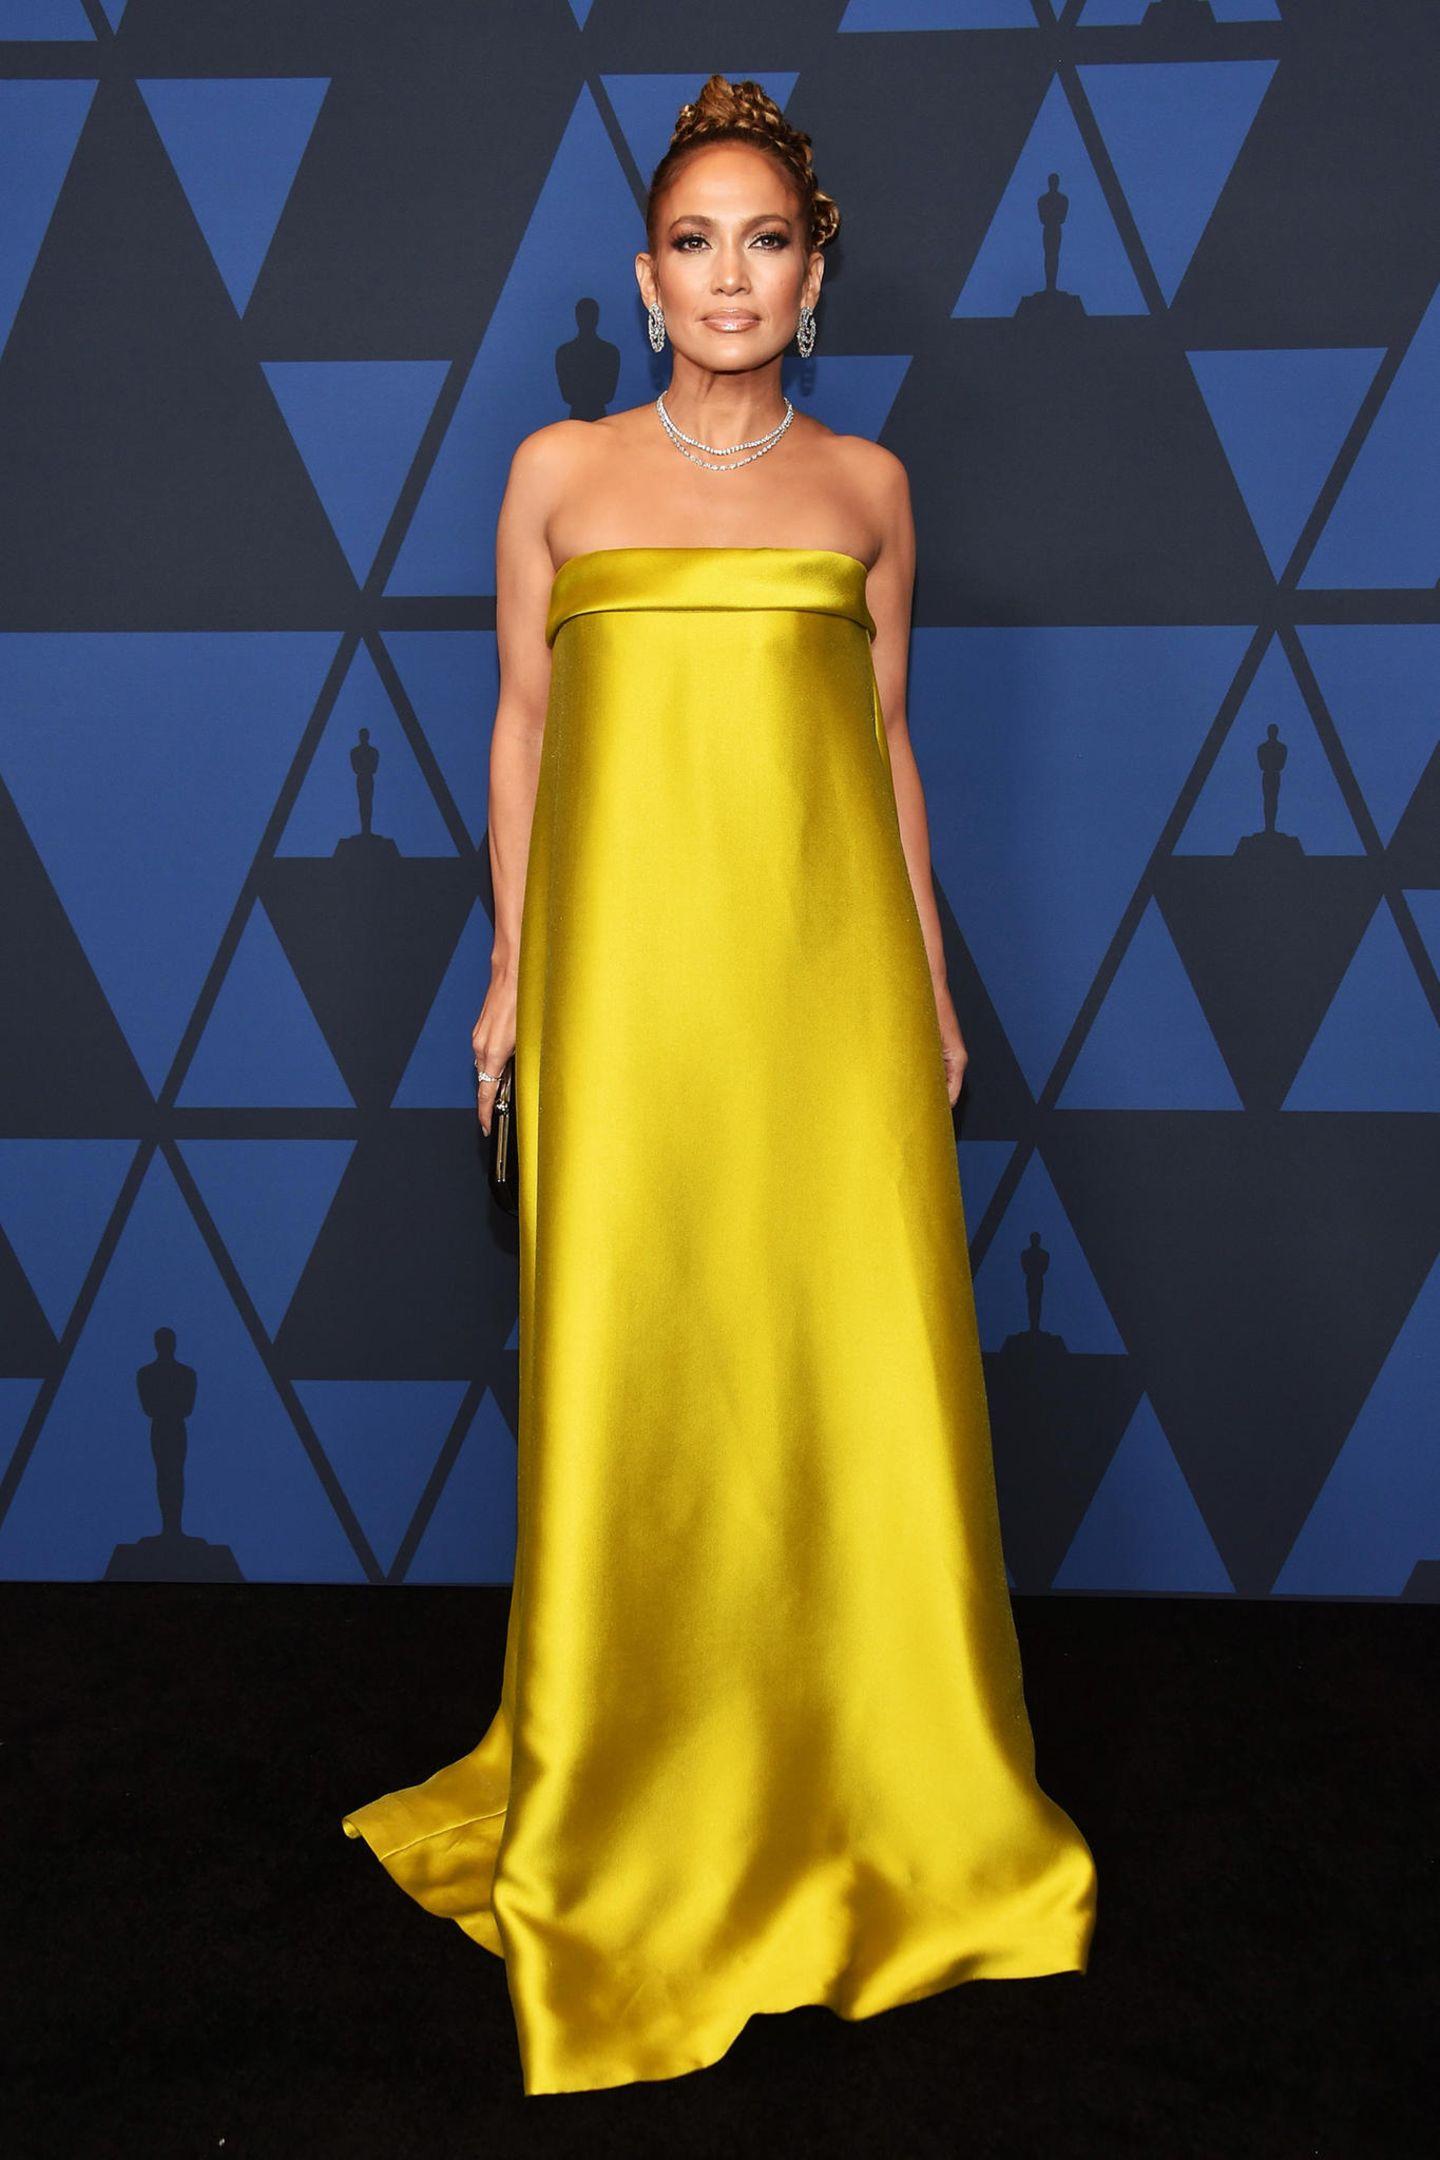 Sonnig, seidig, strahlend schön: Jennifer Lopezin Reem Acra